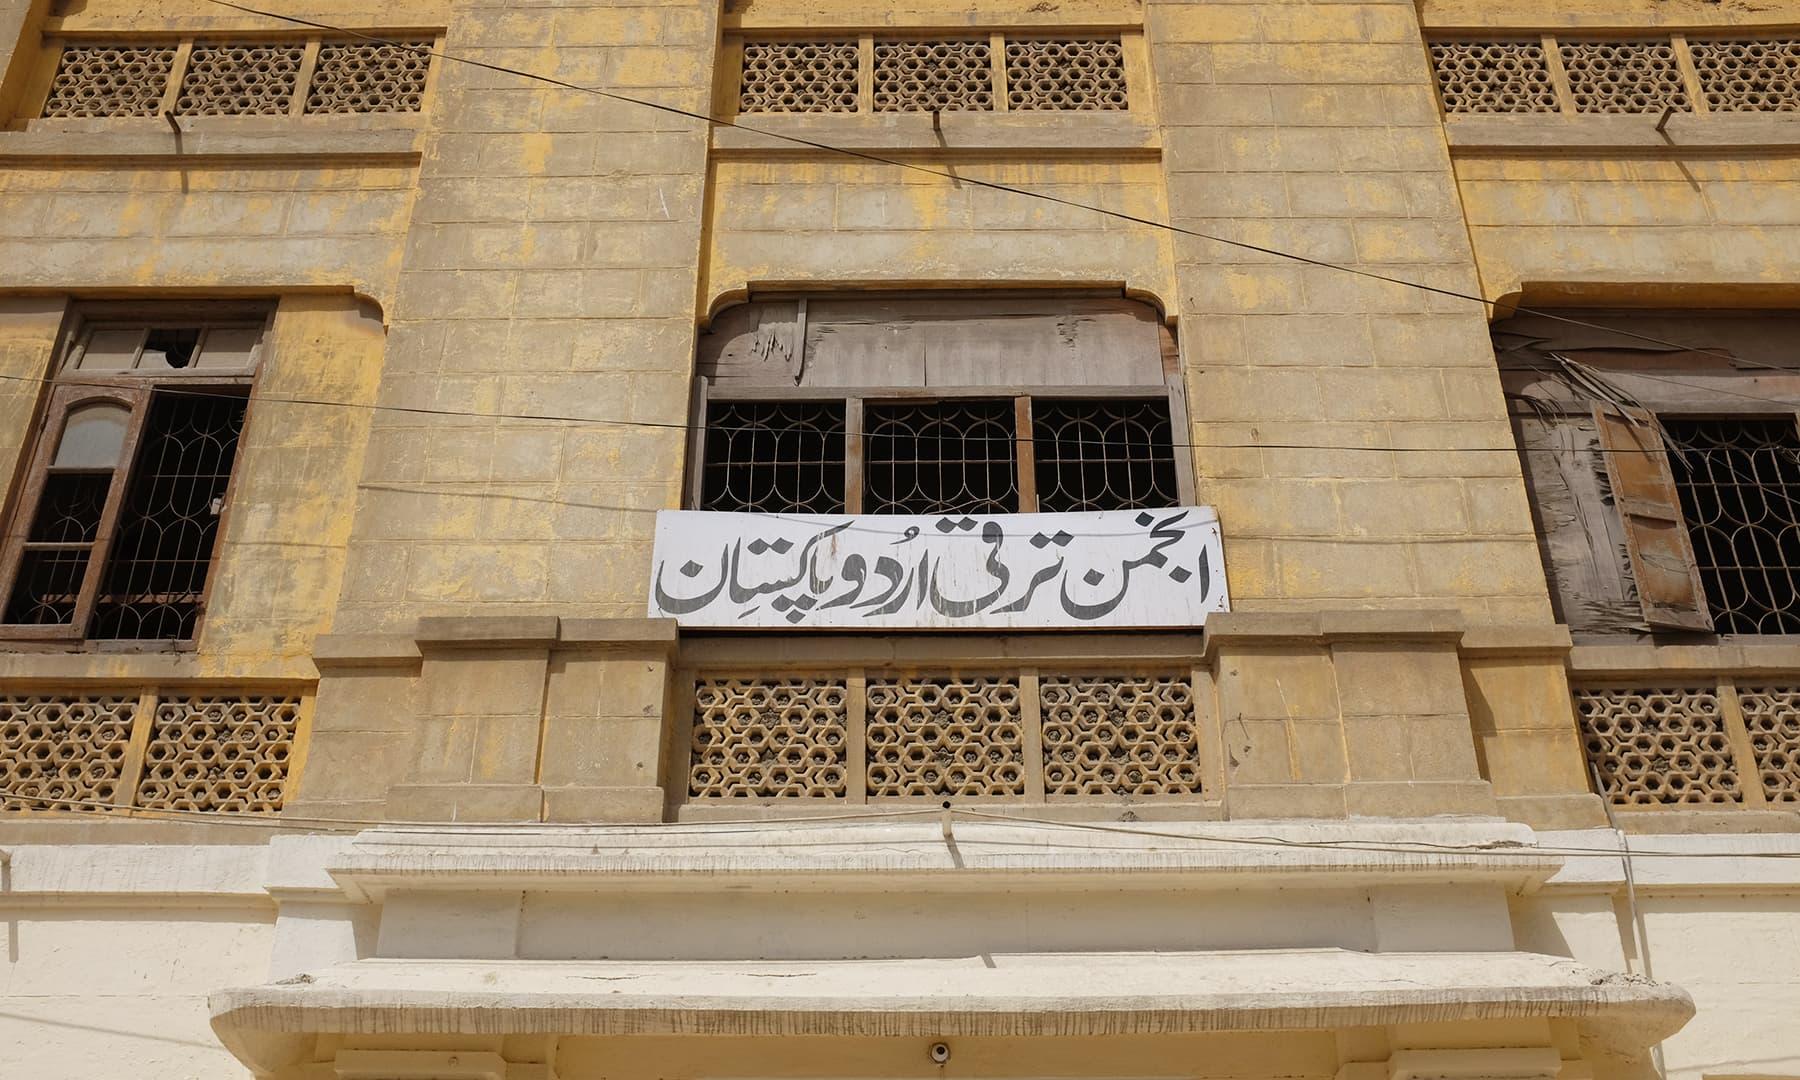 Anjuman-e-Taraqi-e-Urdu.